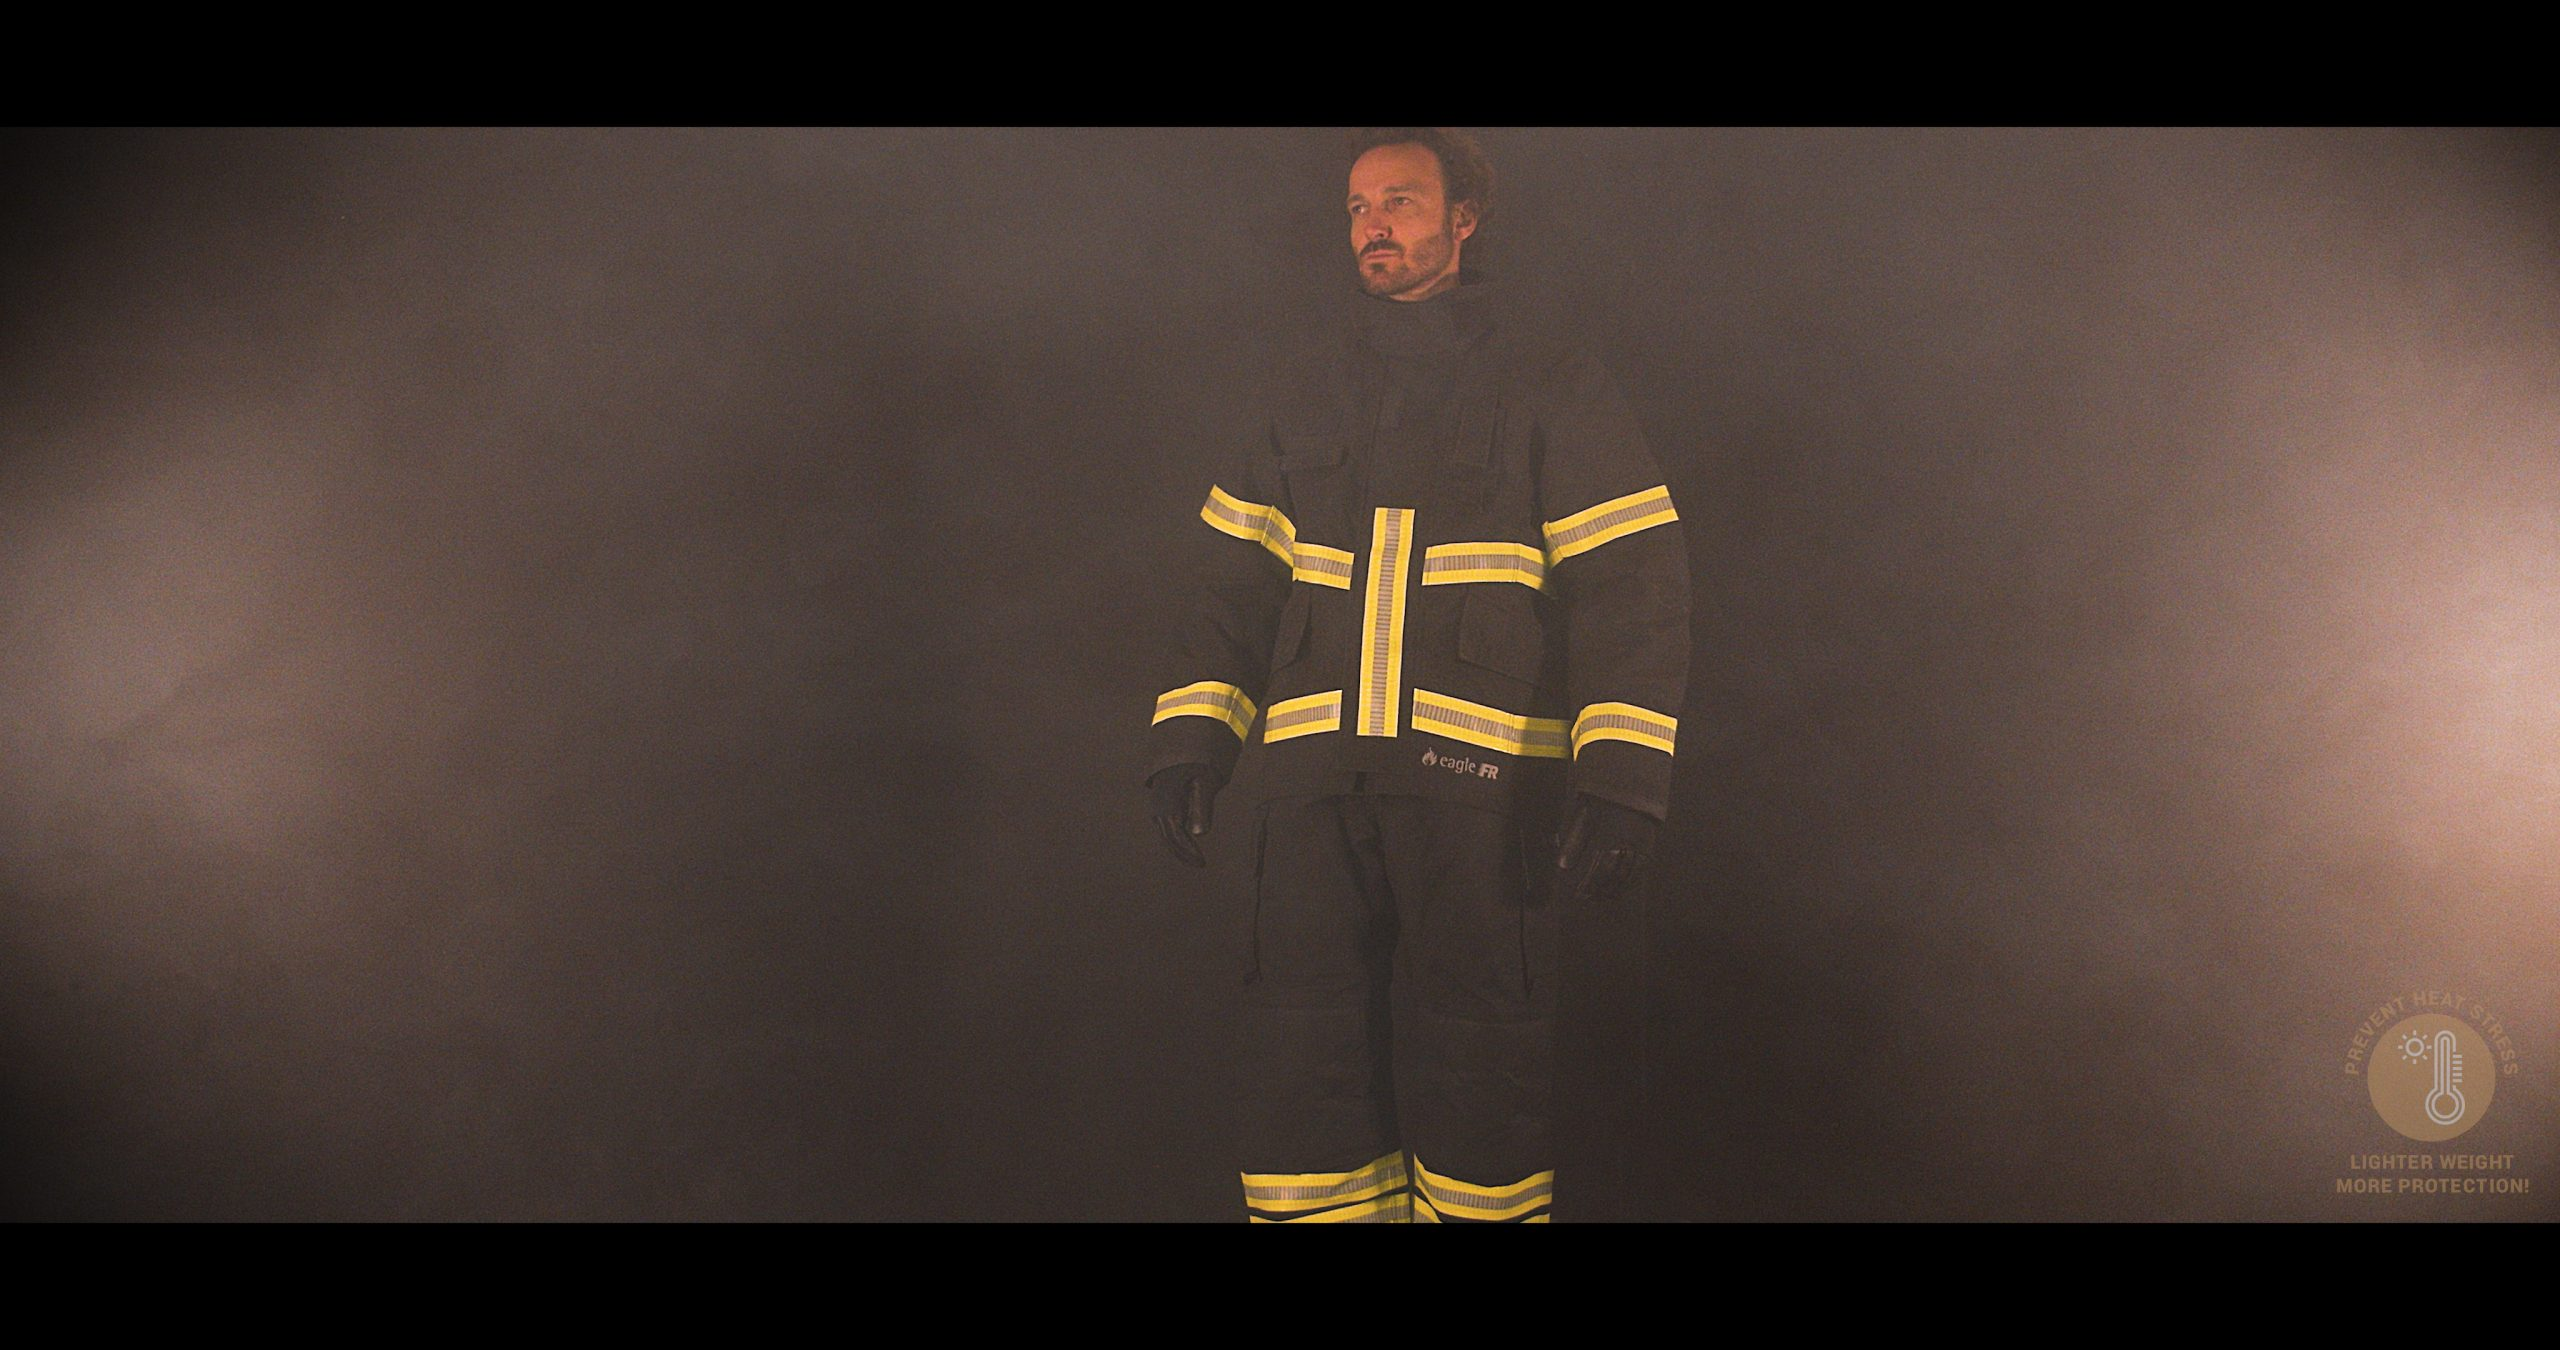 Eagle Vulcan Fire Suit with PBI Gemini XTL, Stedair 3000E & NightGlow